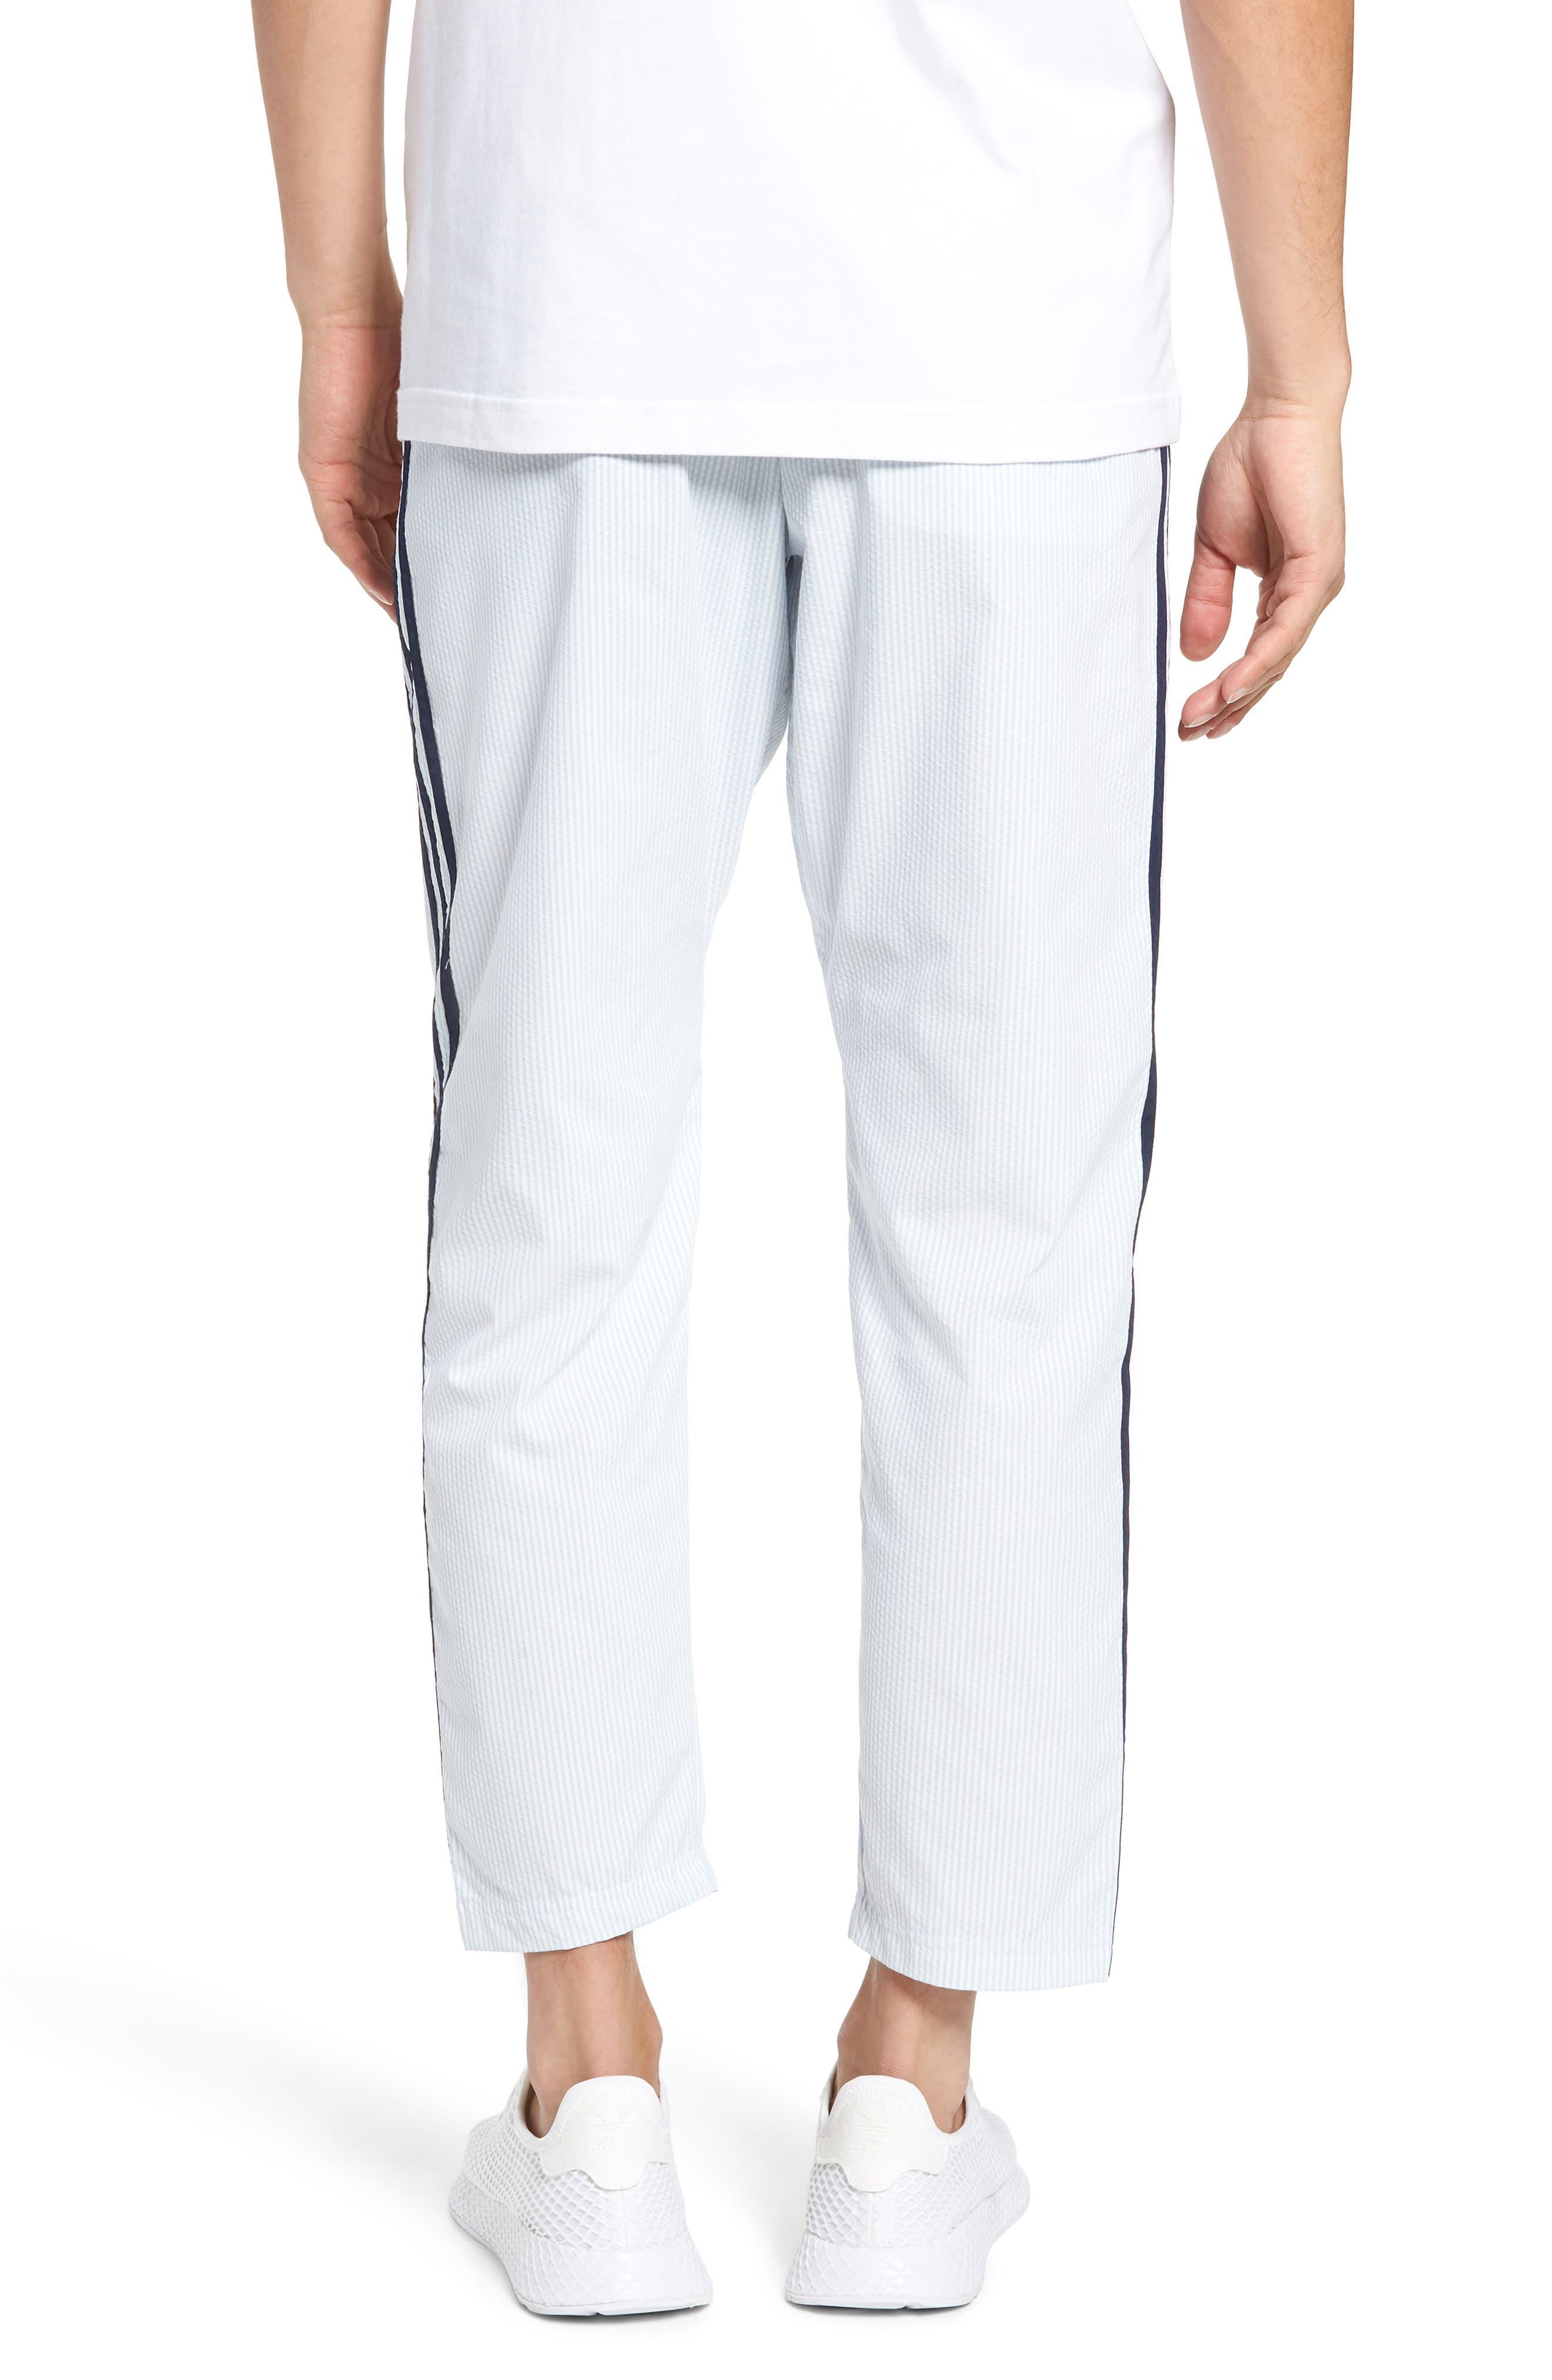 ADIDAS ORIGINALS, Seersucker Track Pants, Alternate thumbnail 2, color, ASH GREY/ WHITE